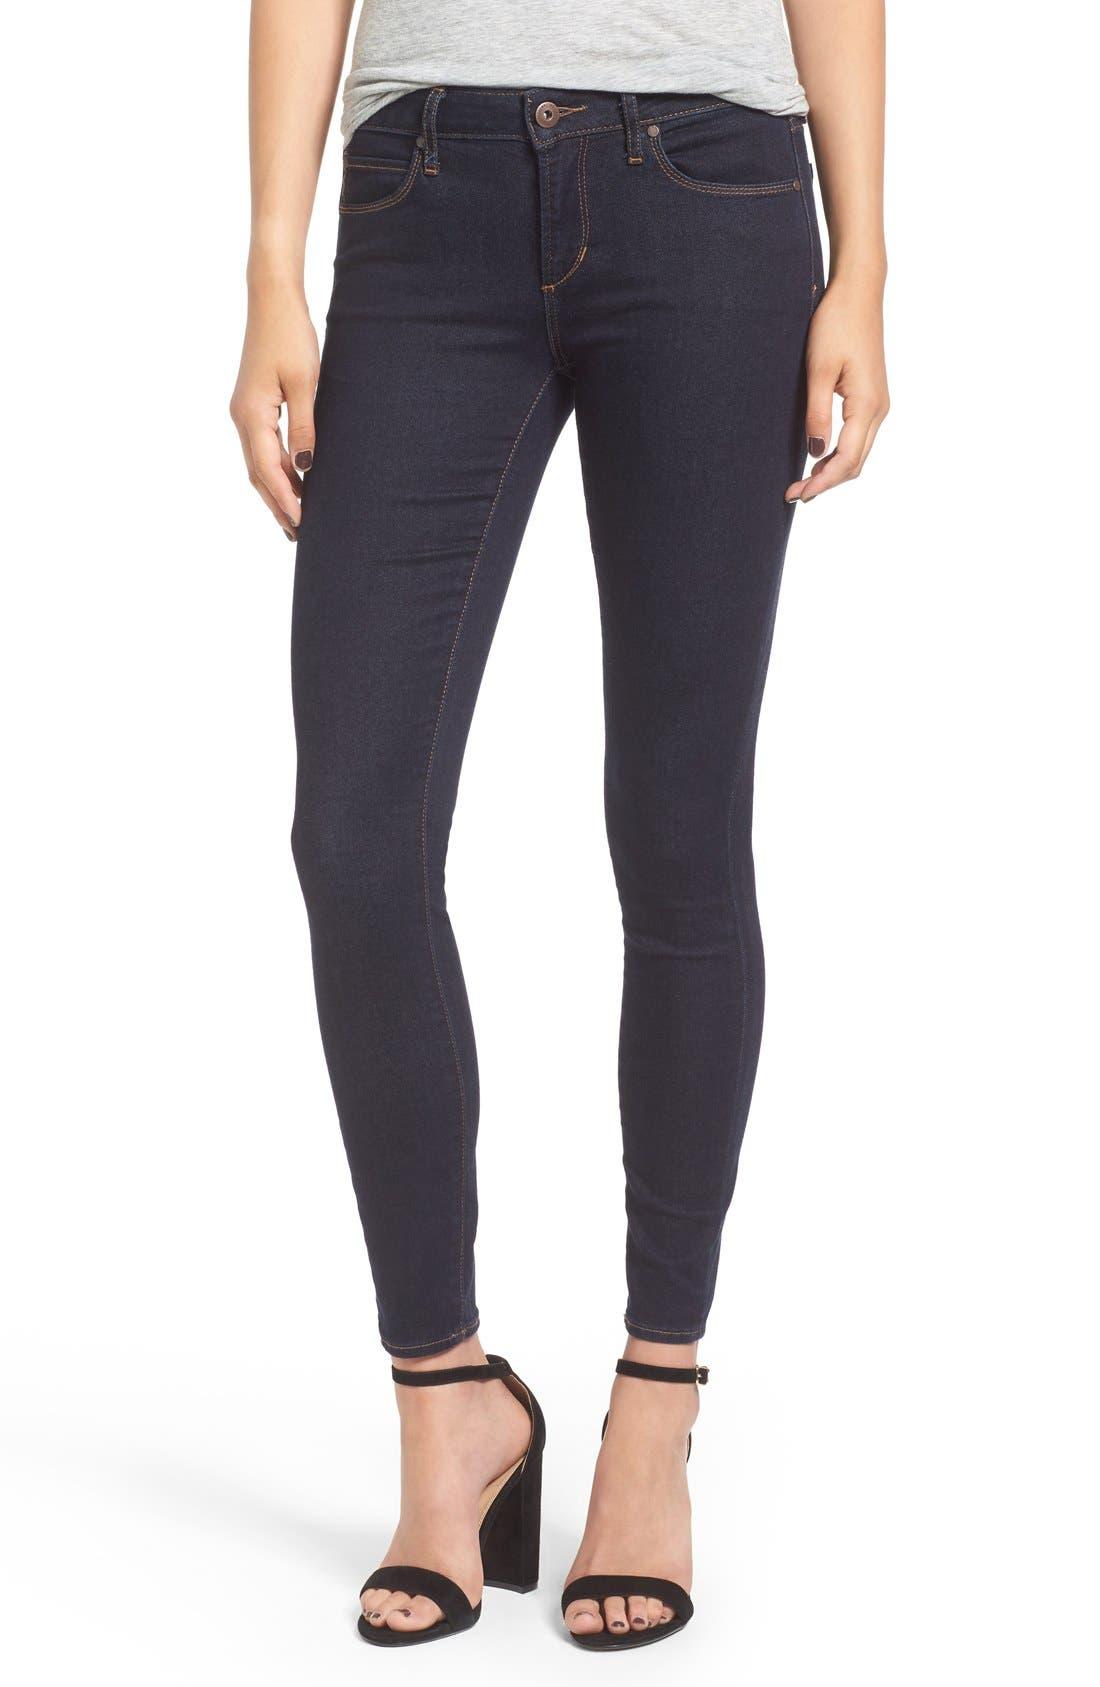 Main Image - Articles of Society 'Sarah' Skinny Jeans (Melrose)